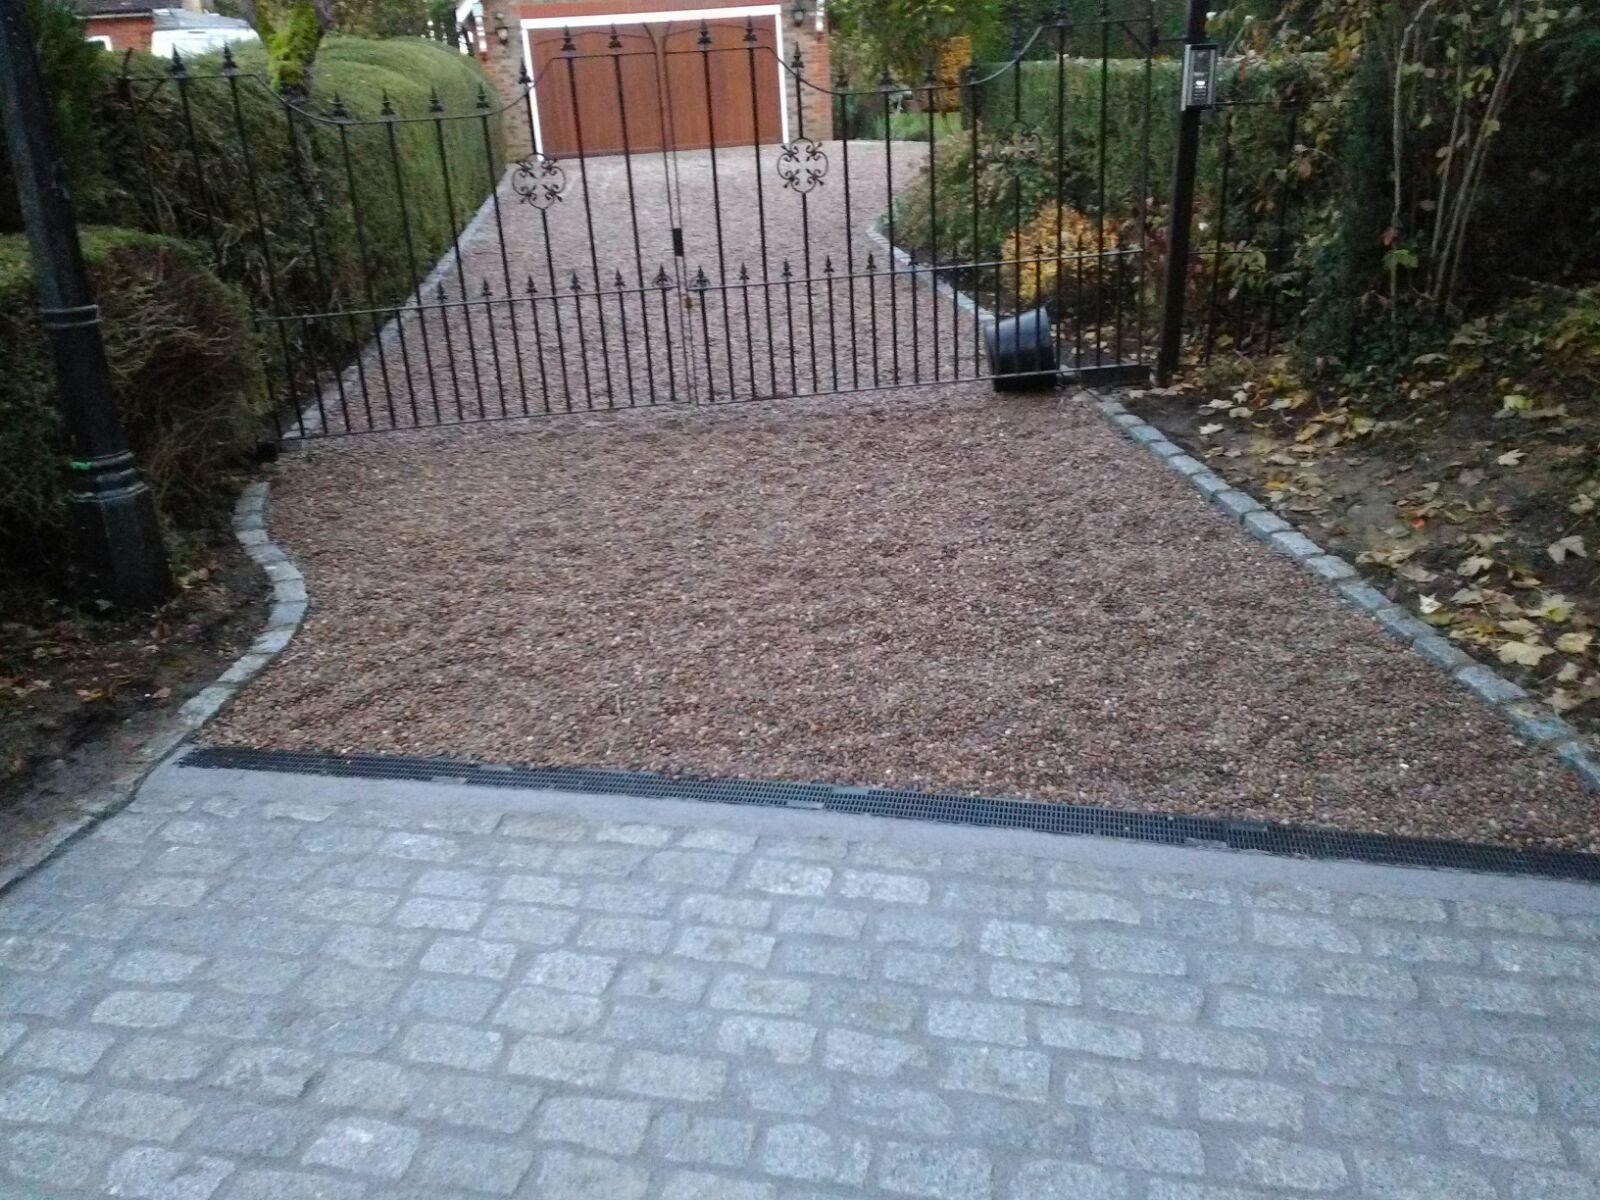 Gravel Driveway Calculator - Estimate Material for a ... |Stone Driveways